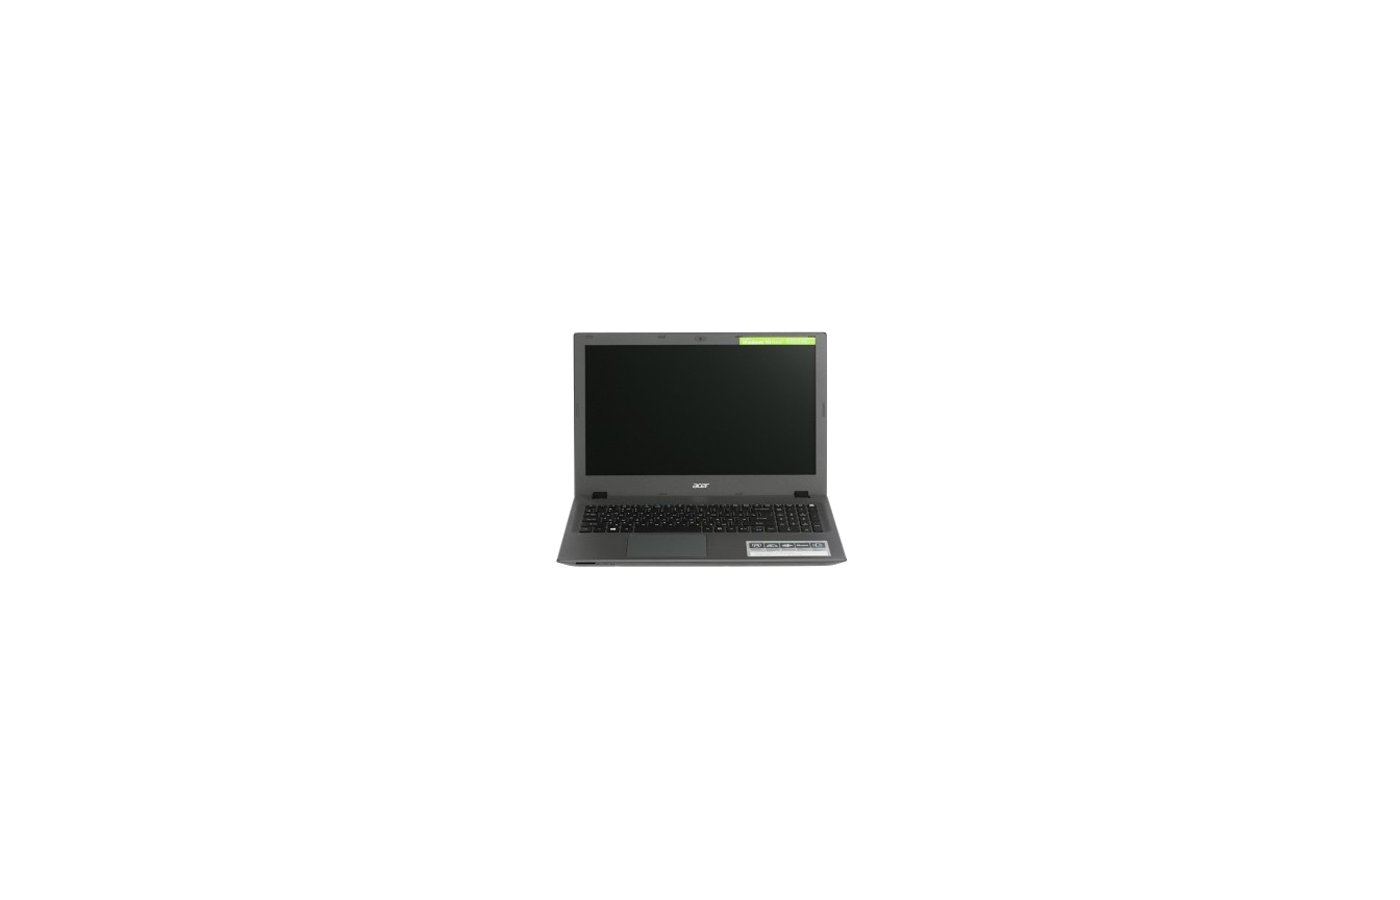 Ноутбук Acer E5-573-C68M /NX.MVHER.010/ intel 3215U/4Gb/500GB/DVDRW/15.6/WiFi/Linux